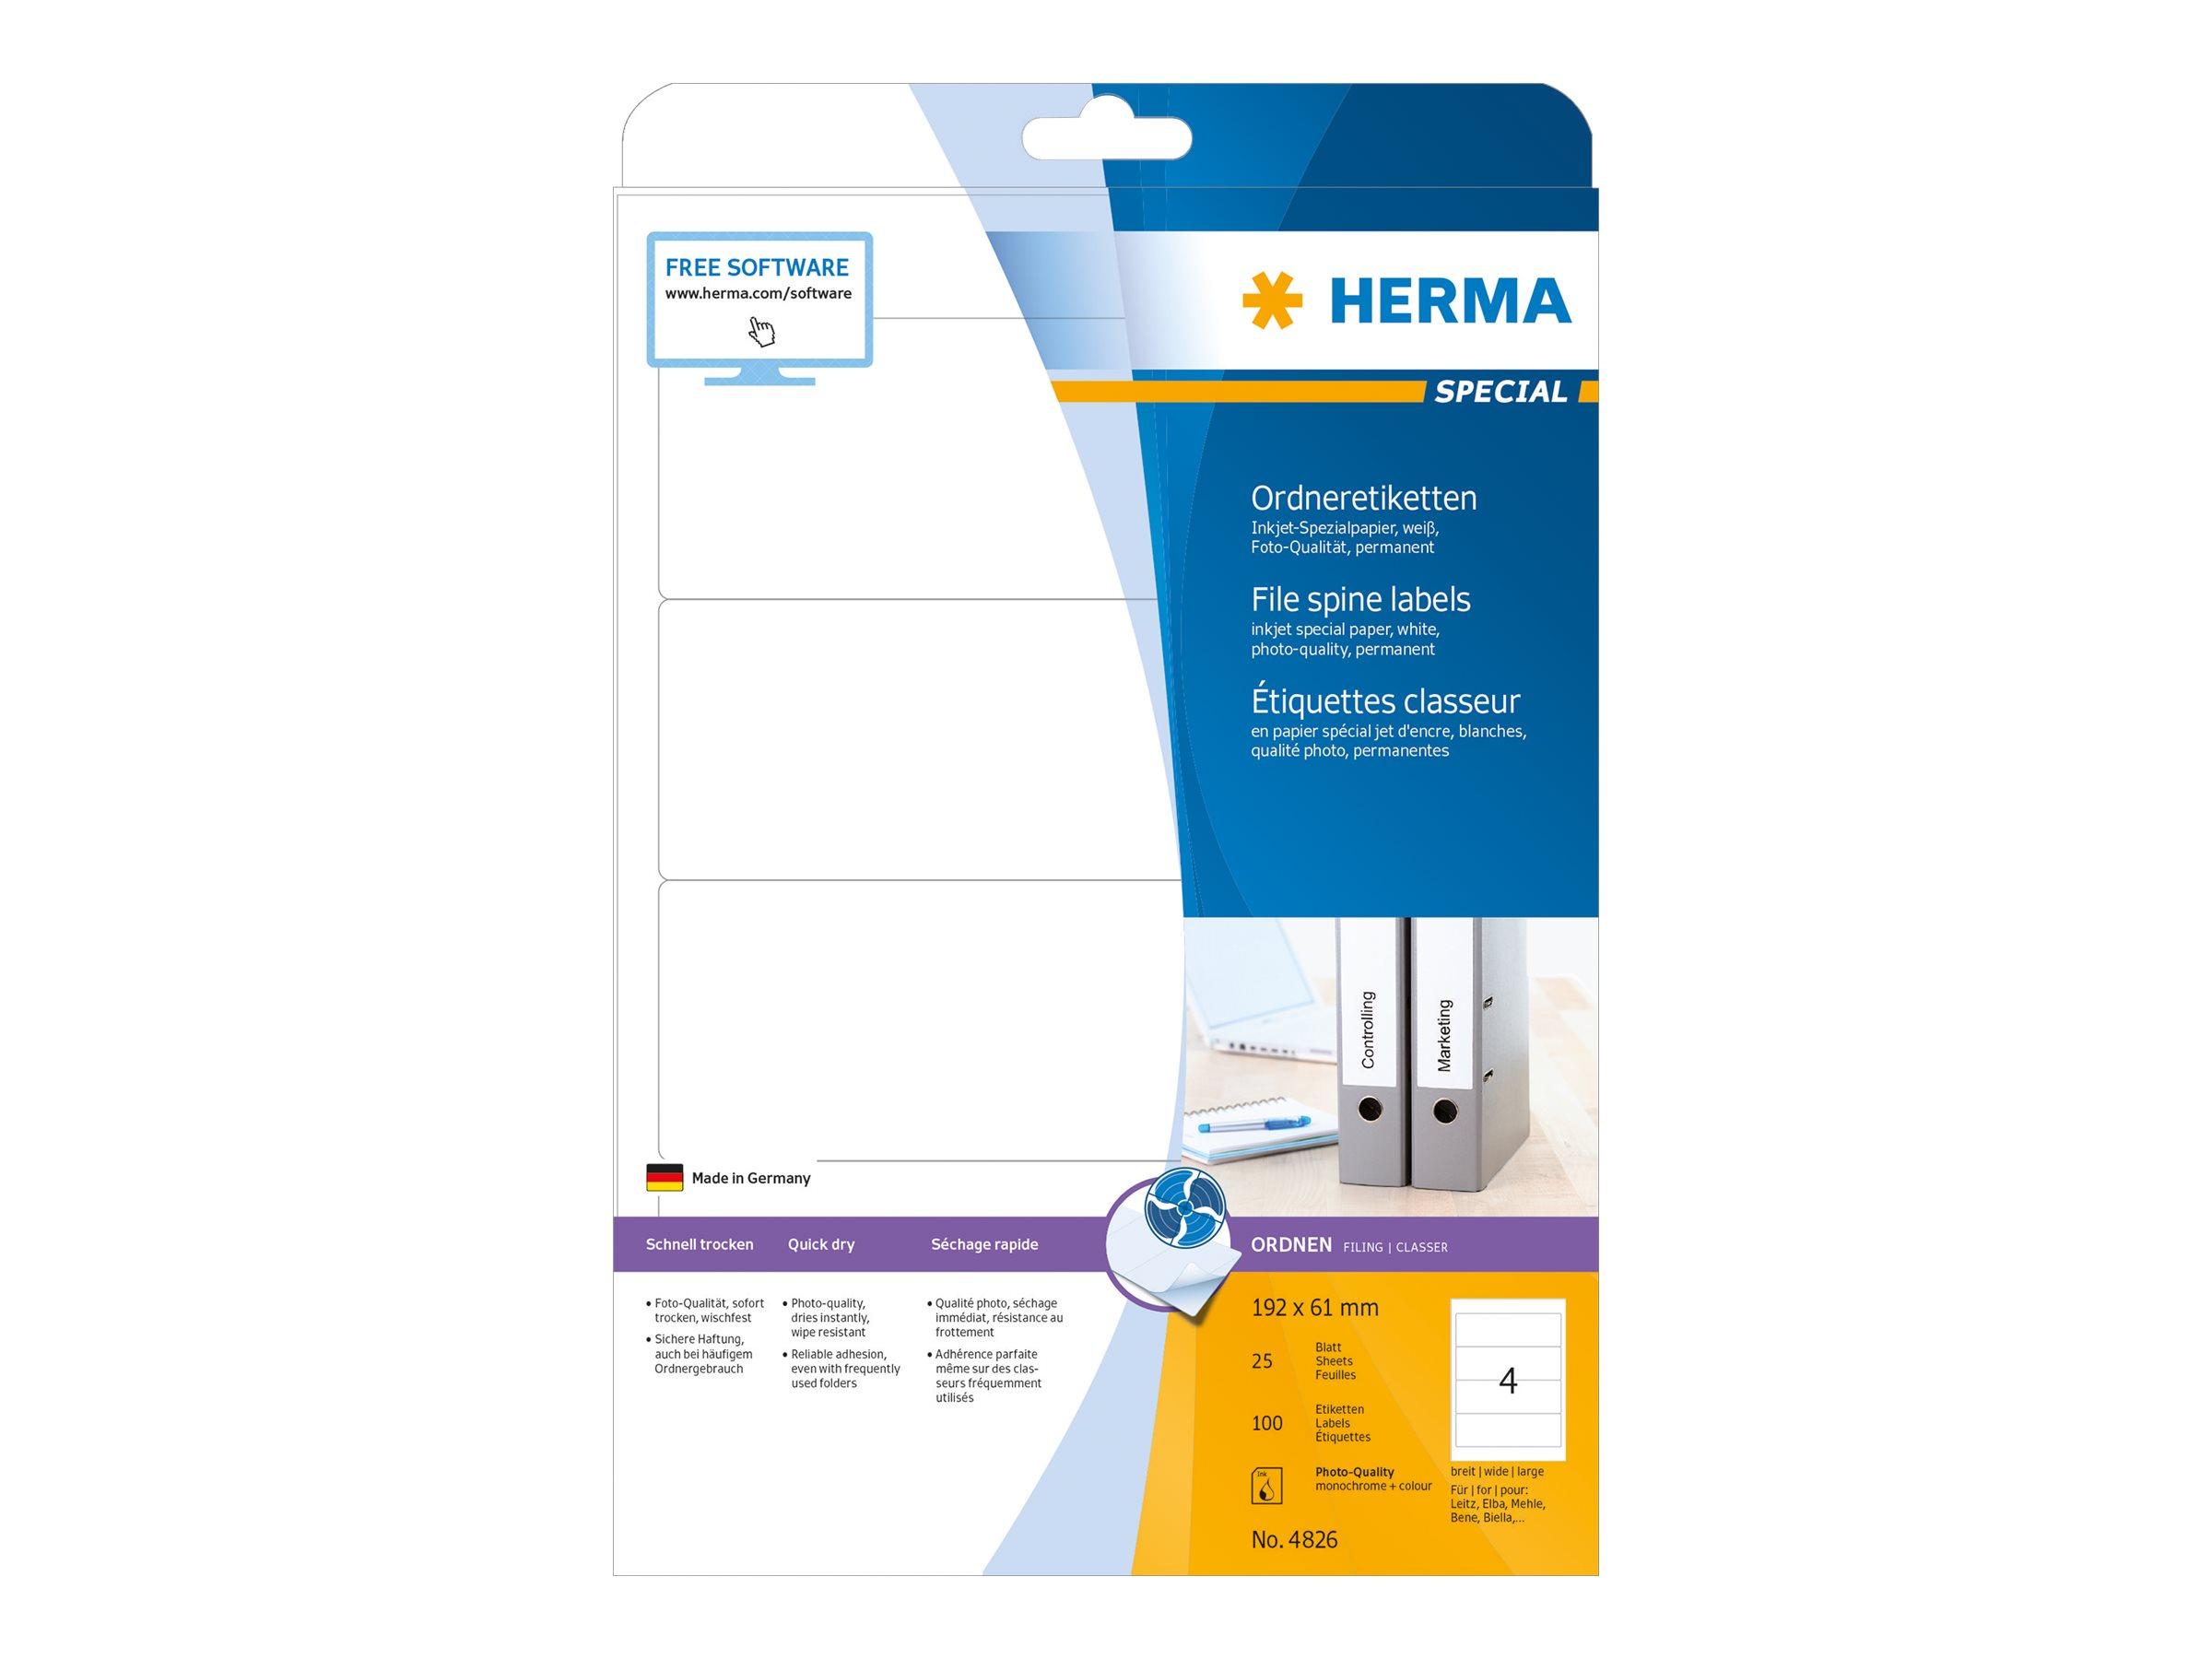 HERMA Special - Papier - matt - permanent selbstklebend - beschichtet - weiß - 192 x 61 mm - 90 g/m² - 100 Etikett(en) (25 Bogen x 4)